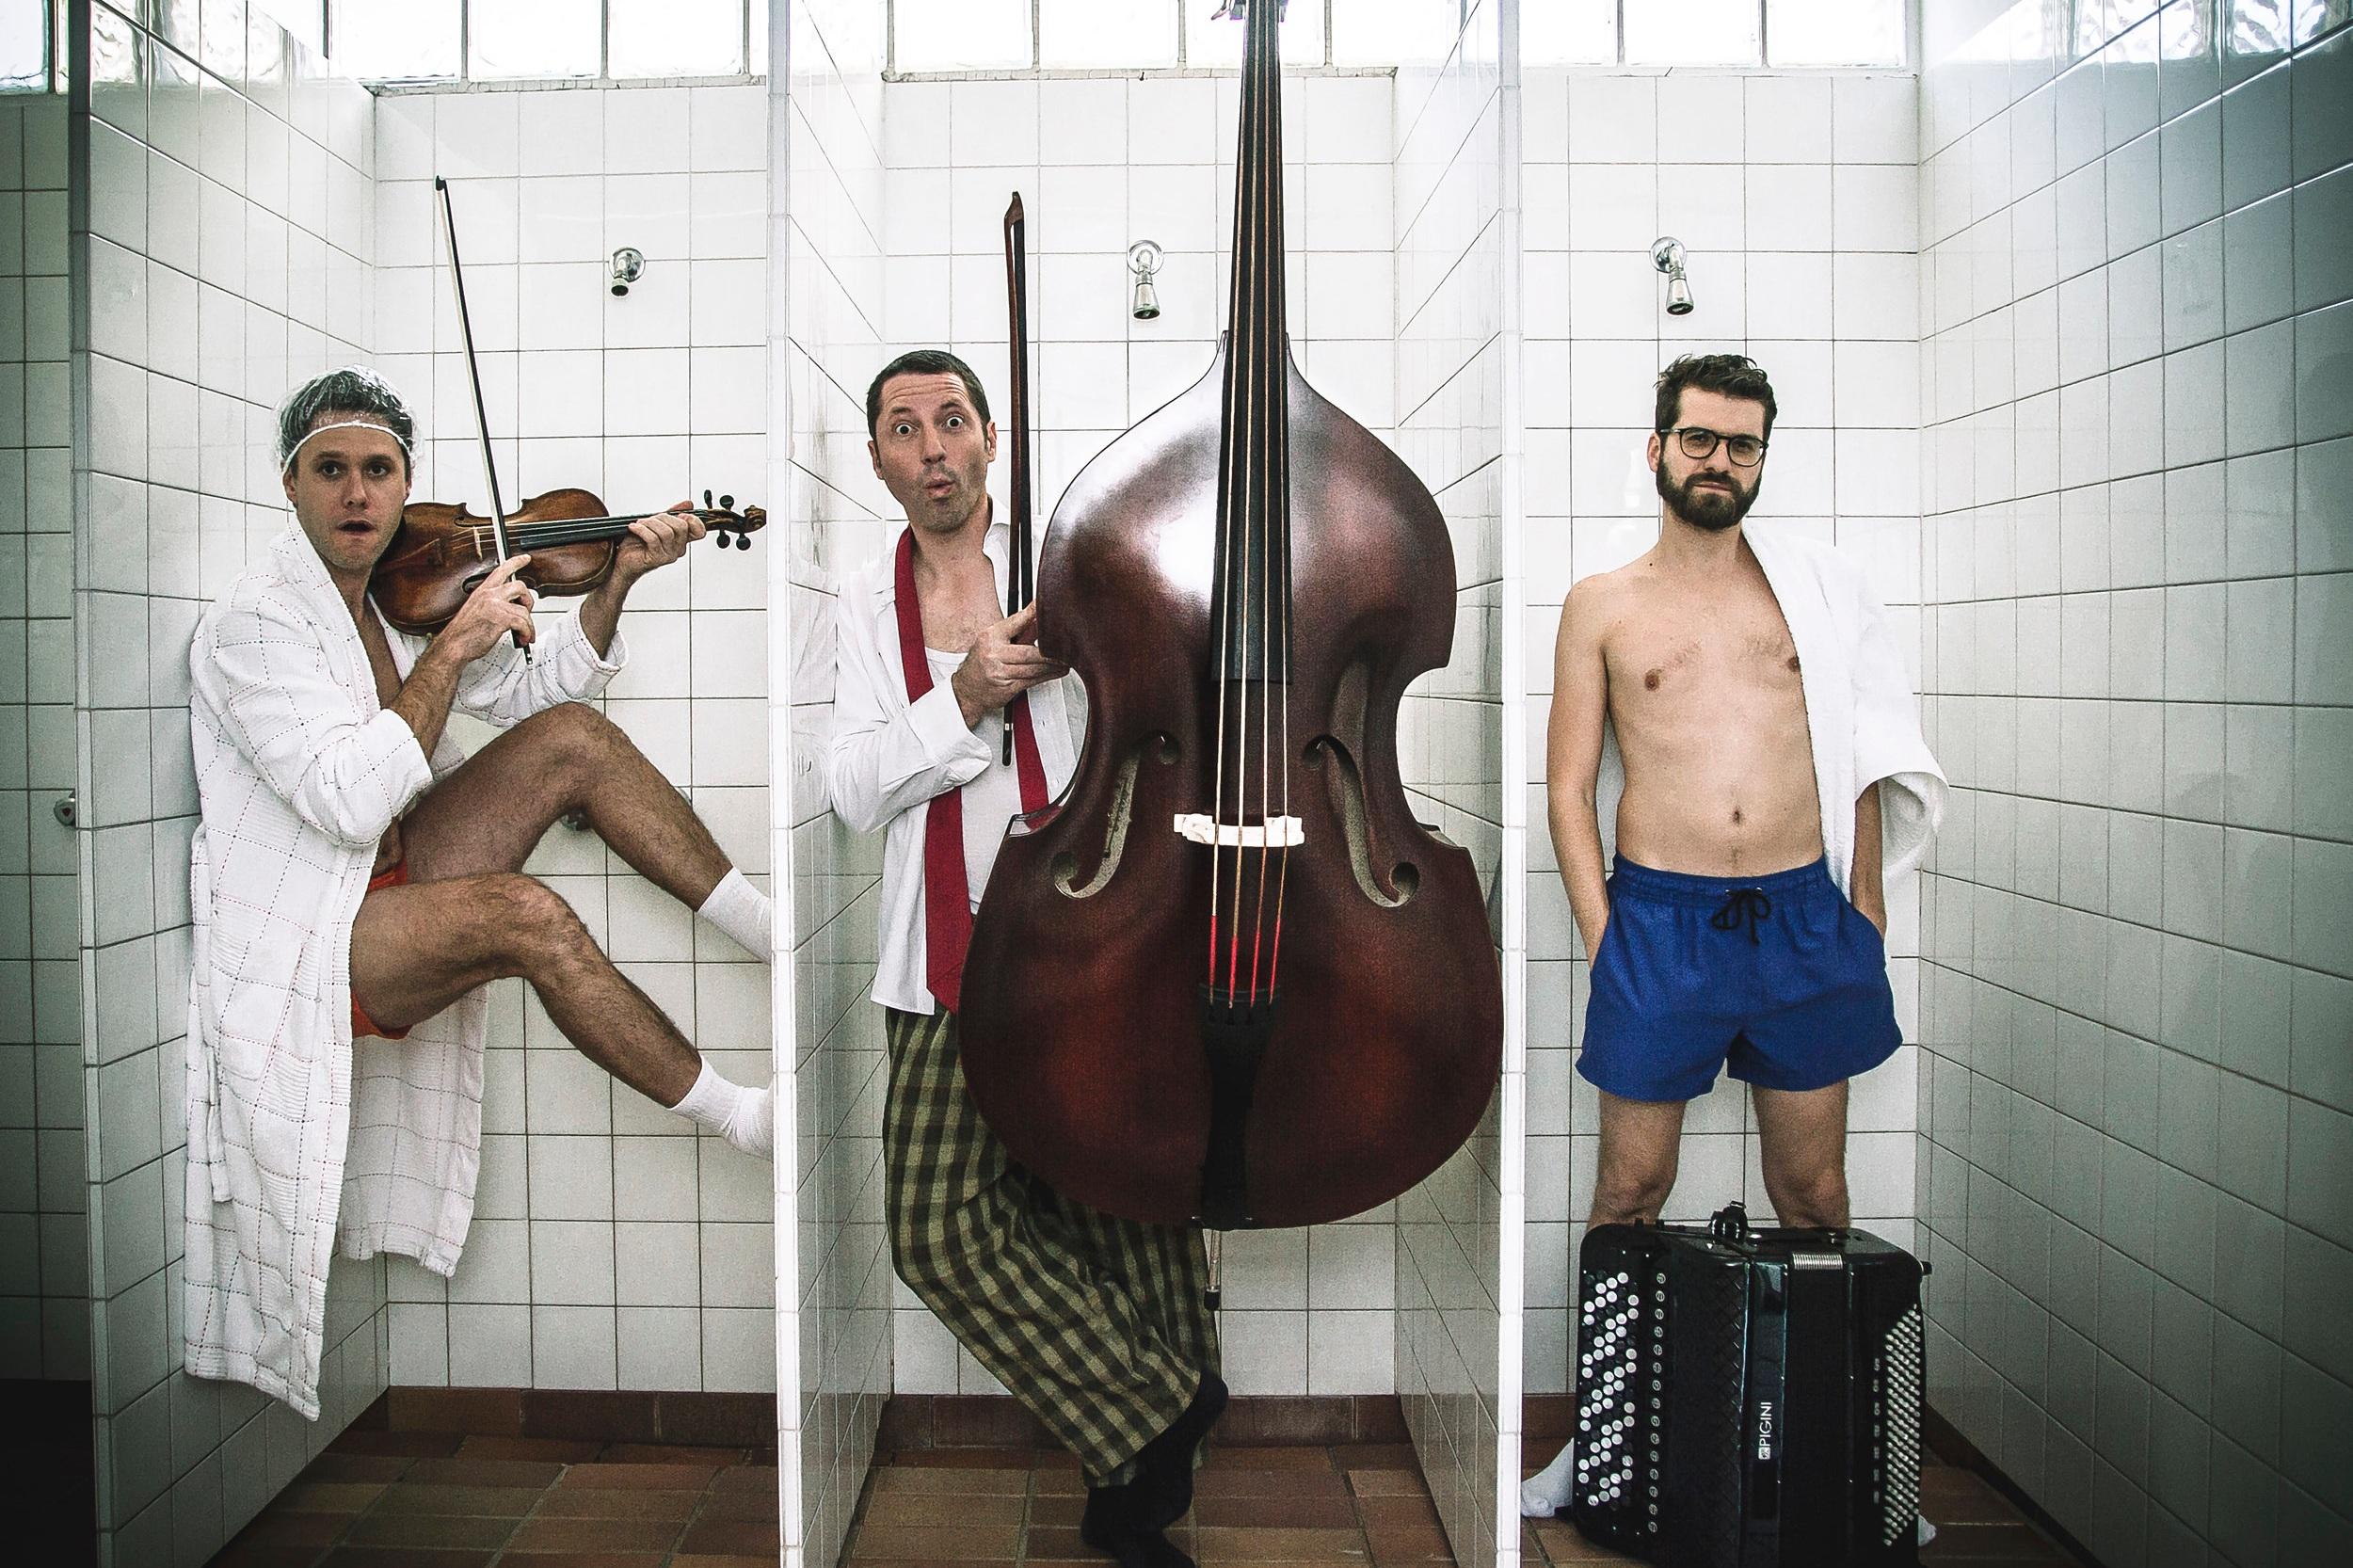 Folksmilch - Christian Bakanic - Accordeon & Percussion, Klemens Bittmann - Violine & Mandola, Eddie Luis - Double Bass & Singing